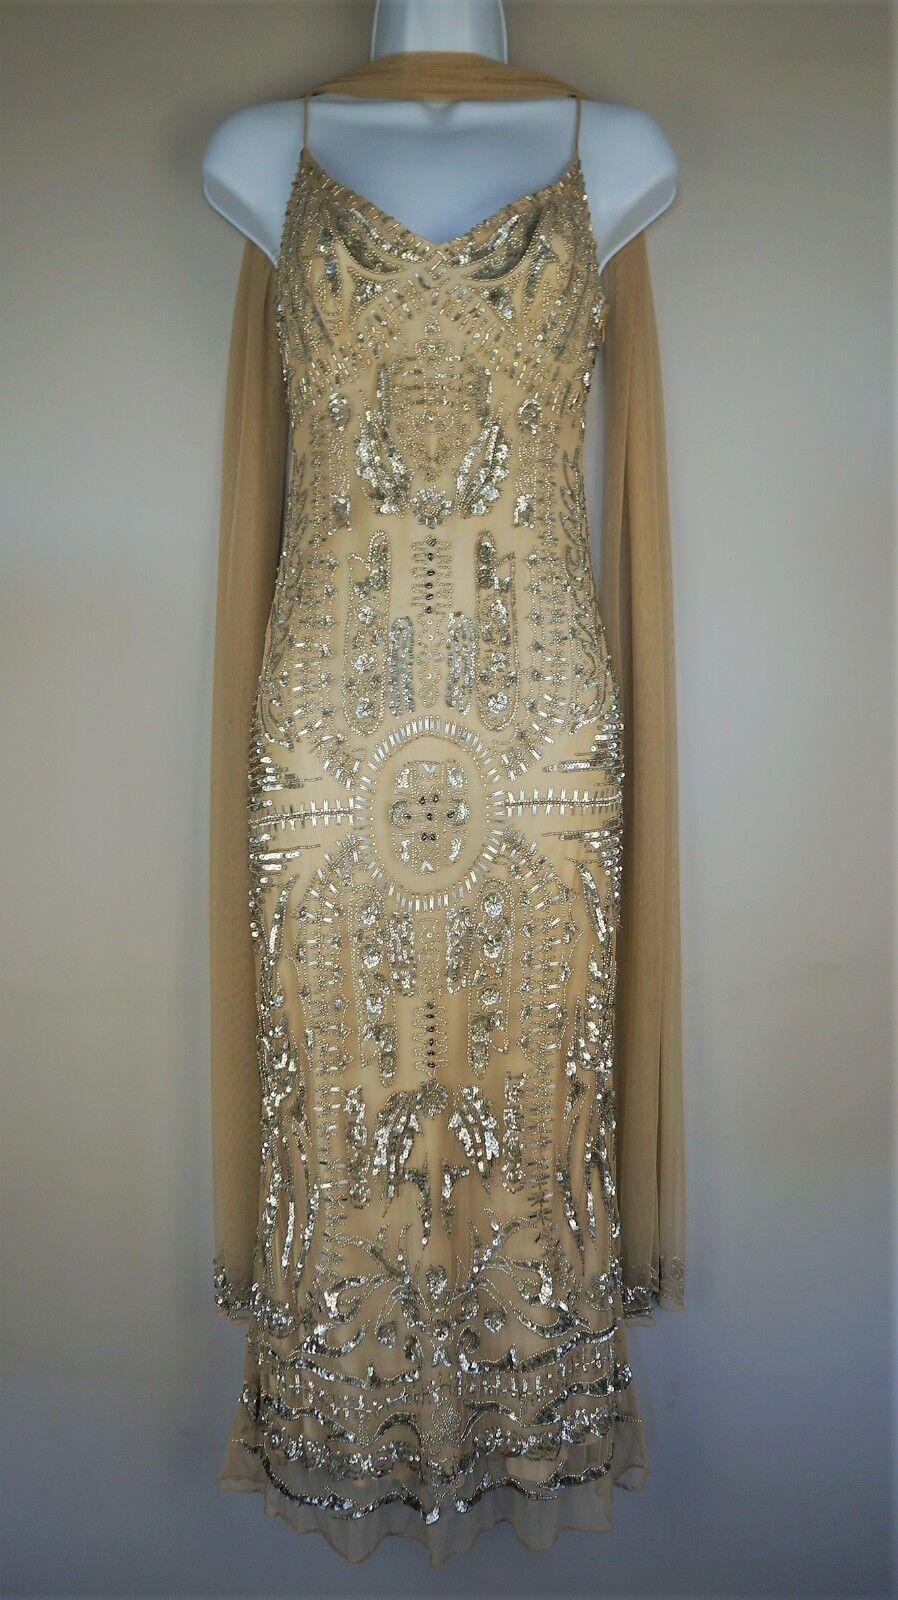 SUPERBE Jovani EntièreHommest Perlé Robe nude Gatsby Style Soirée Occasion Robe SZ 8